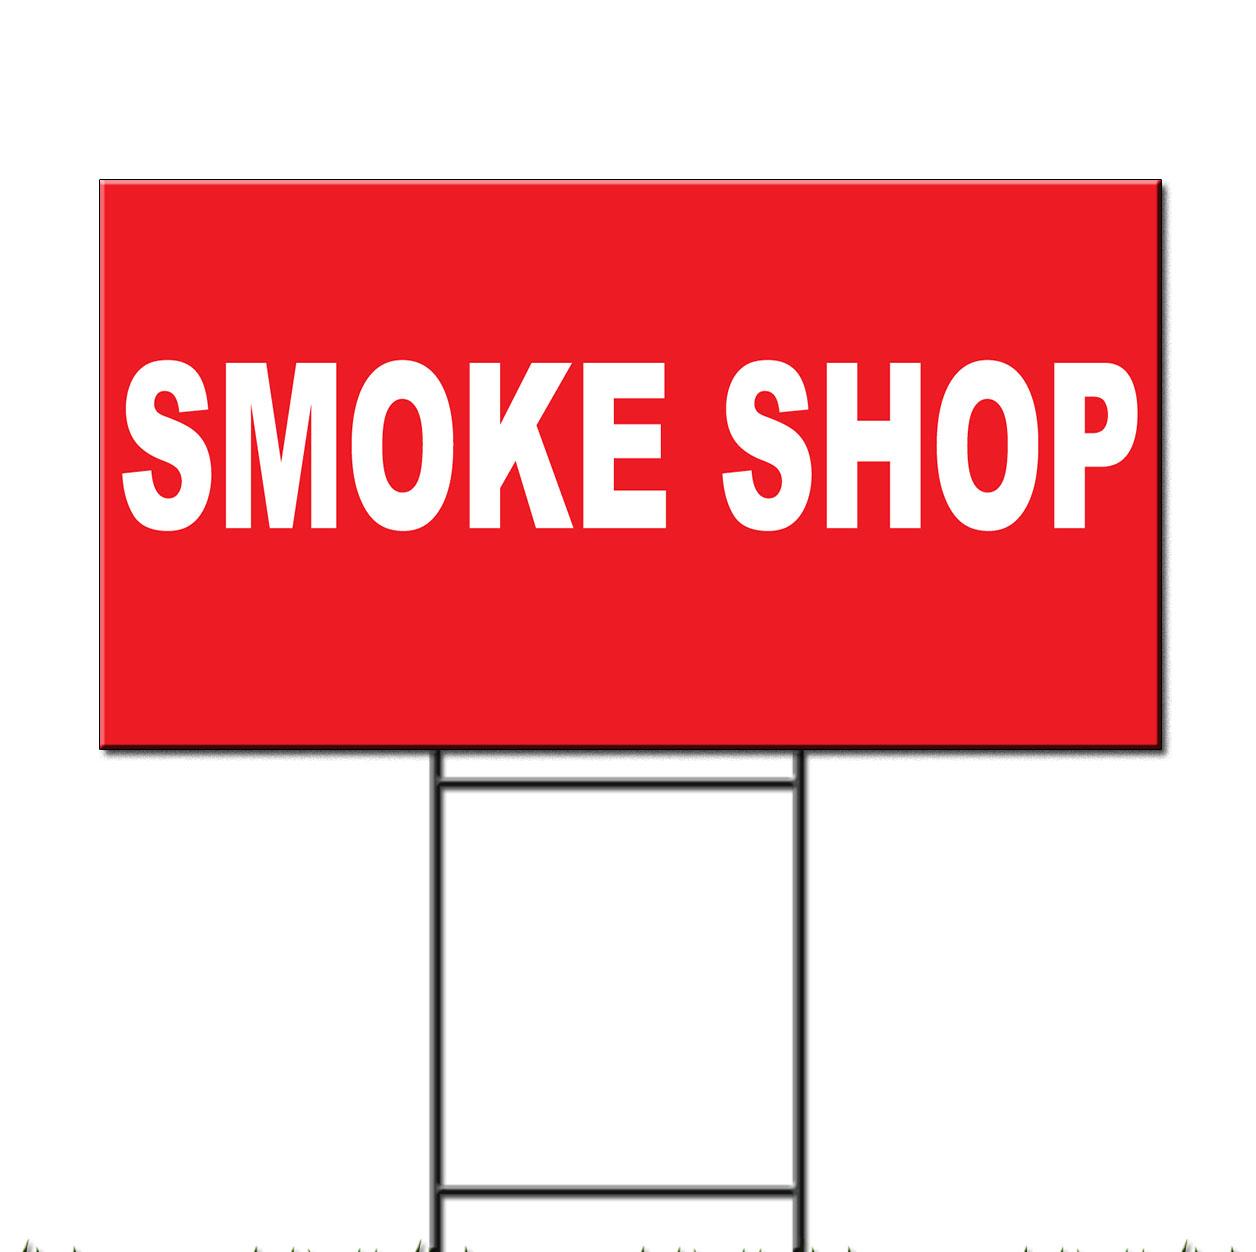 smoke shop red background corrugated plastic yard sign free stakes ebay. Black Bedroom Furniture Sets. Home Design Ideas